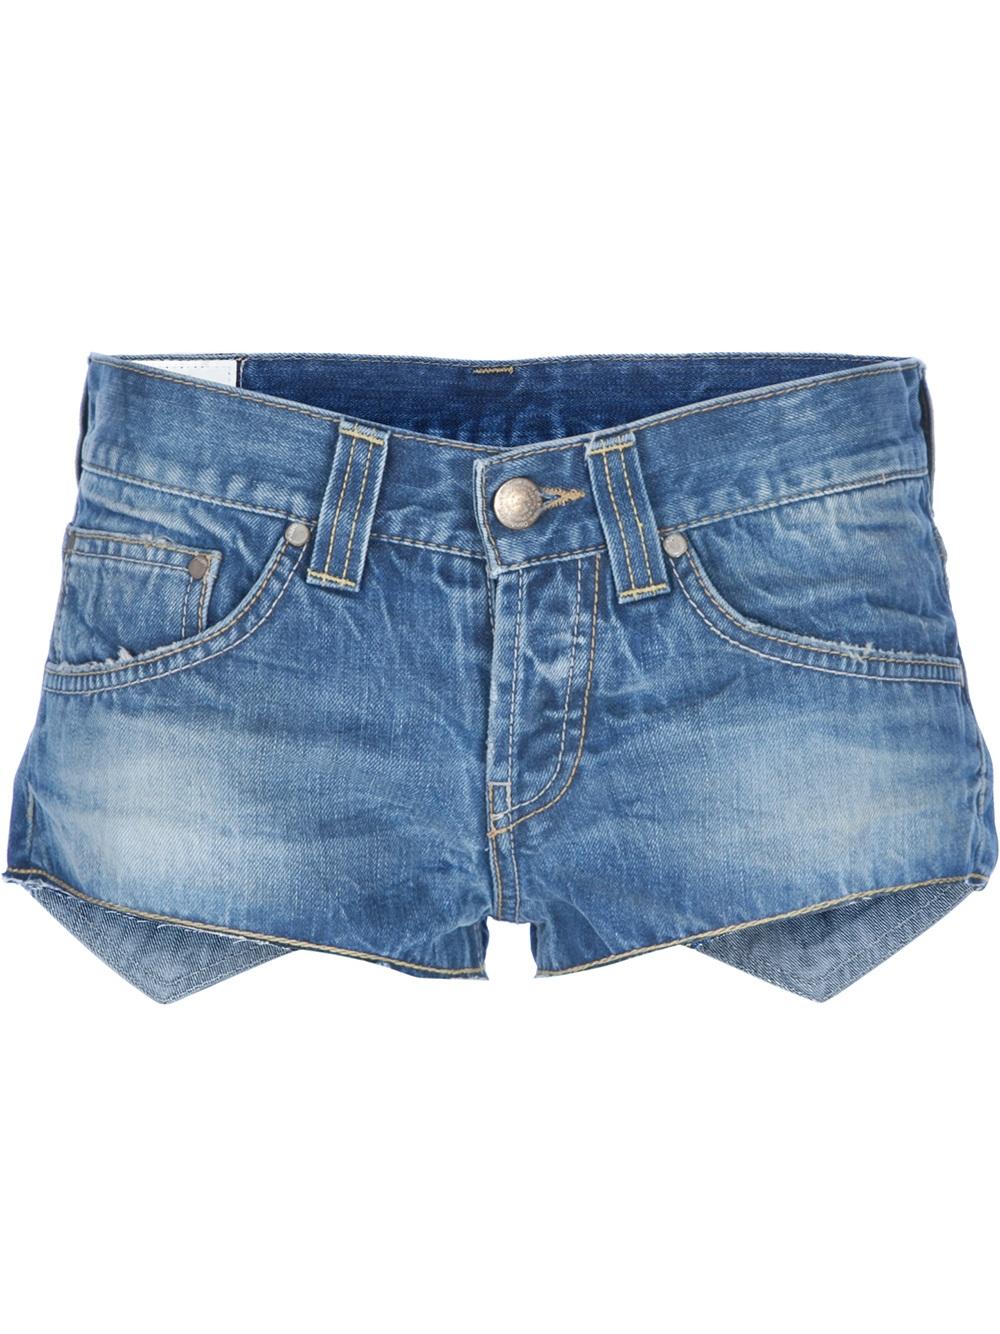 denim micro shorts - photo #1